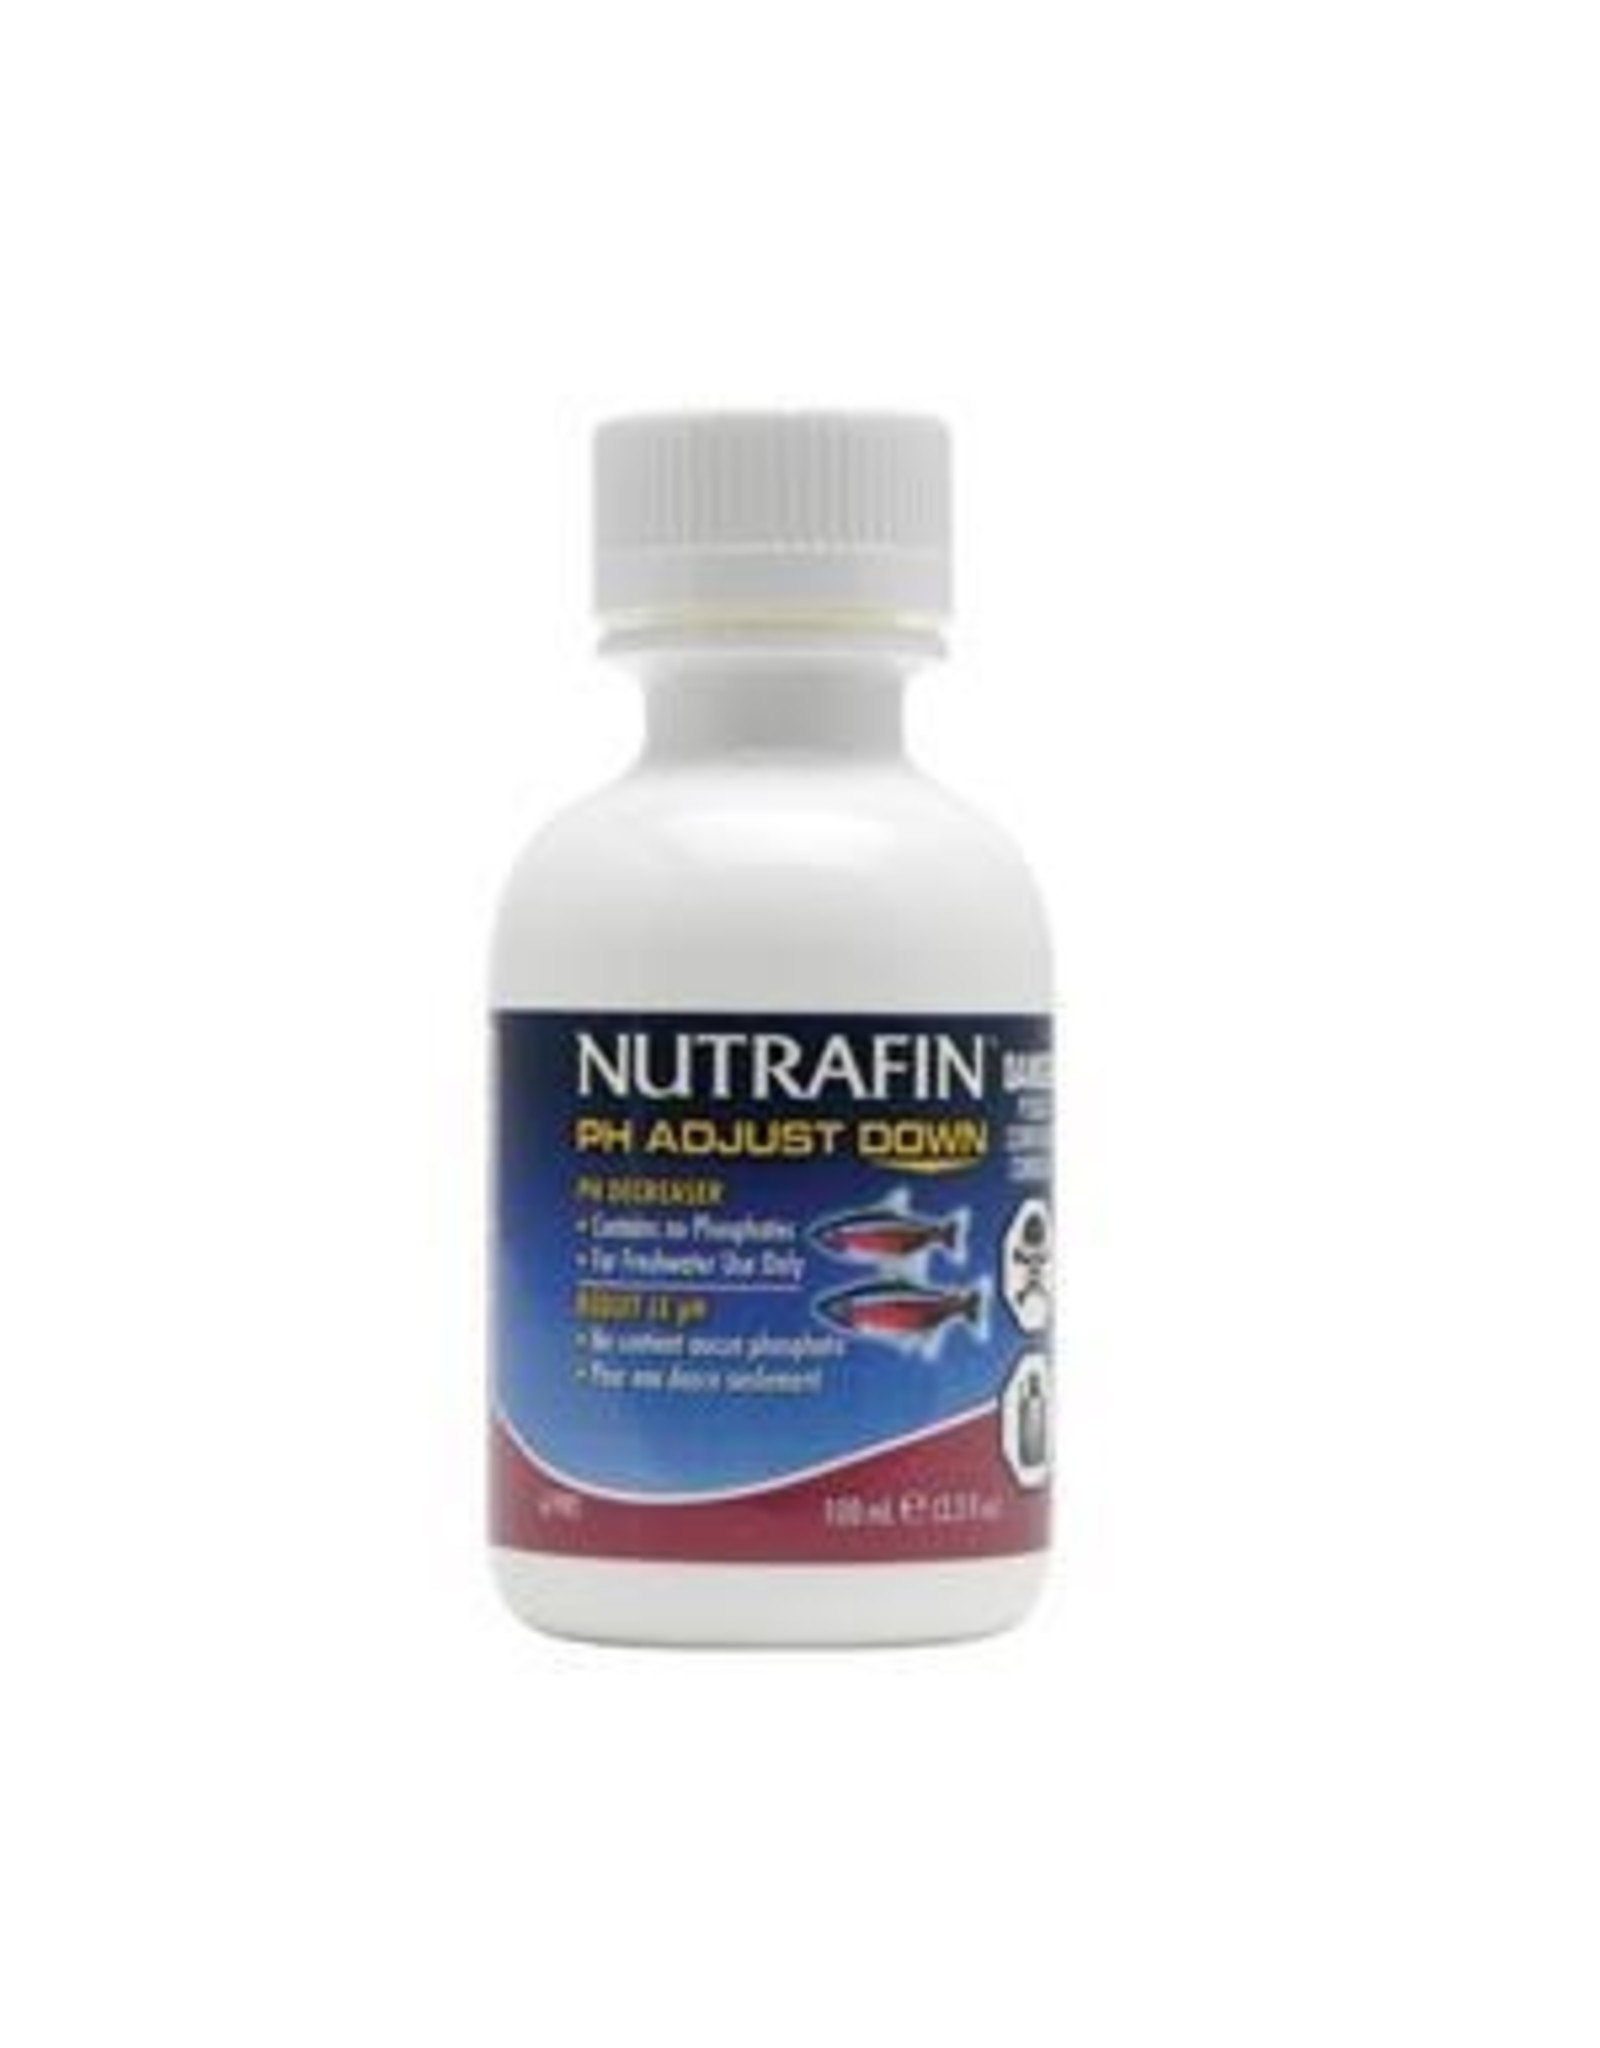 NutraFin NUTRAFIN pH Adj. Down (pH Adjstr) 100ml